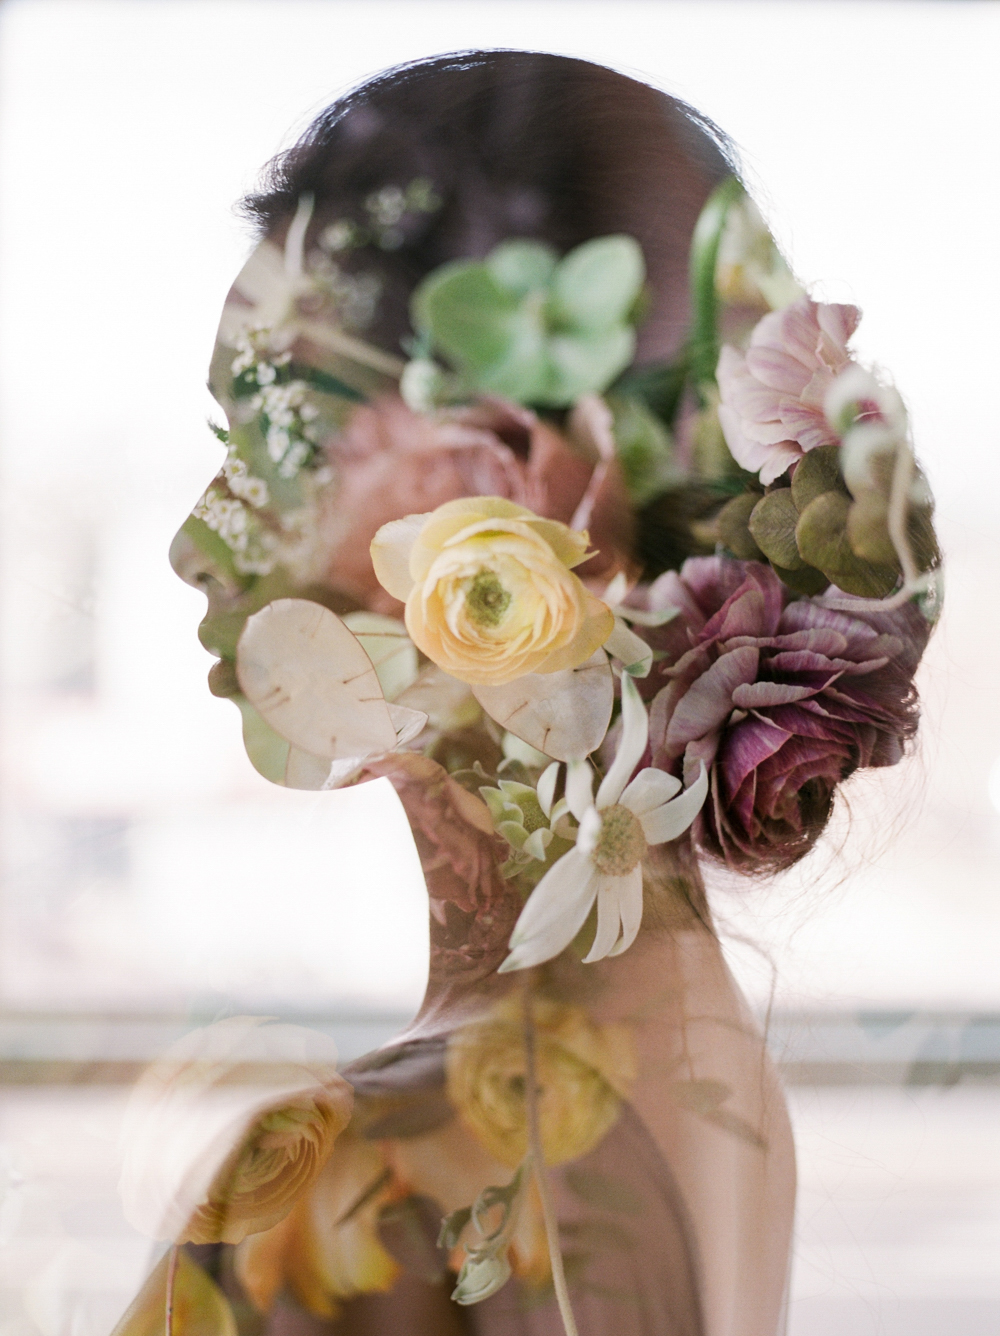 Christine Gosch - destination film photographer - houston wedding photographer - fine art film photographer - elopement photographer - destination wedding - understated wedding - simple beautiful wedding photography-28.jpg